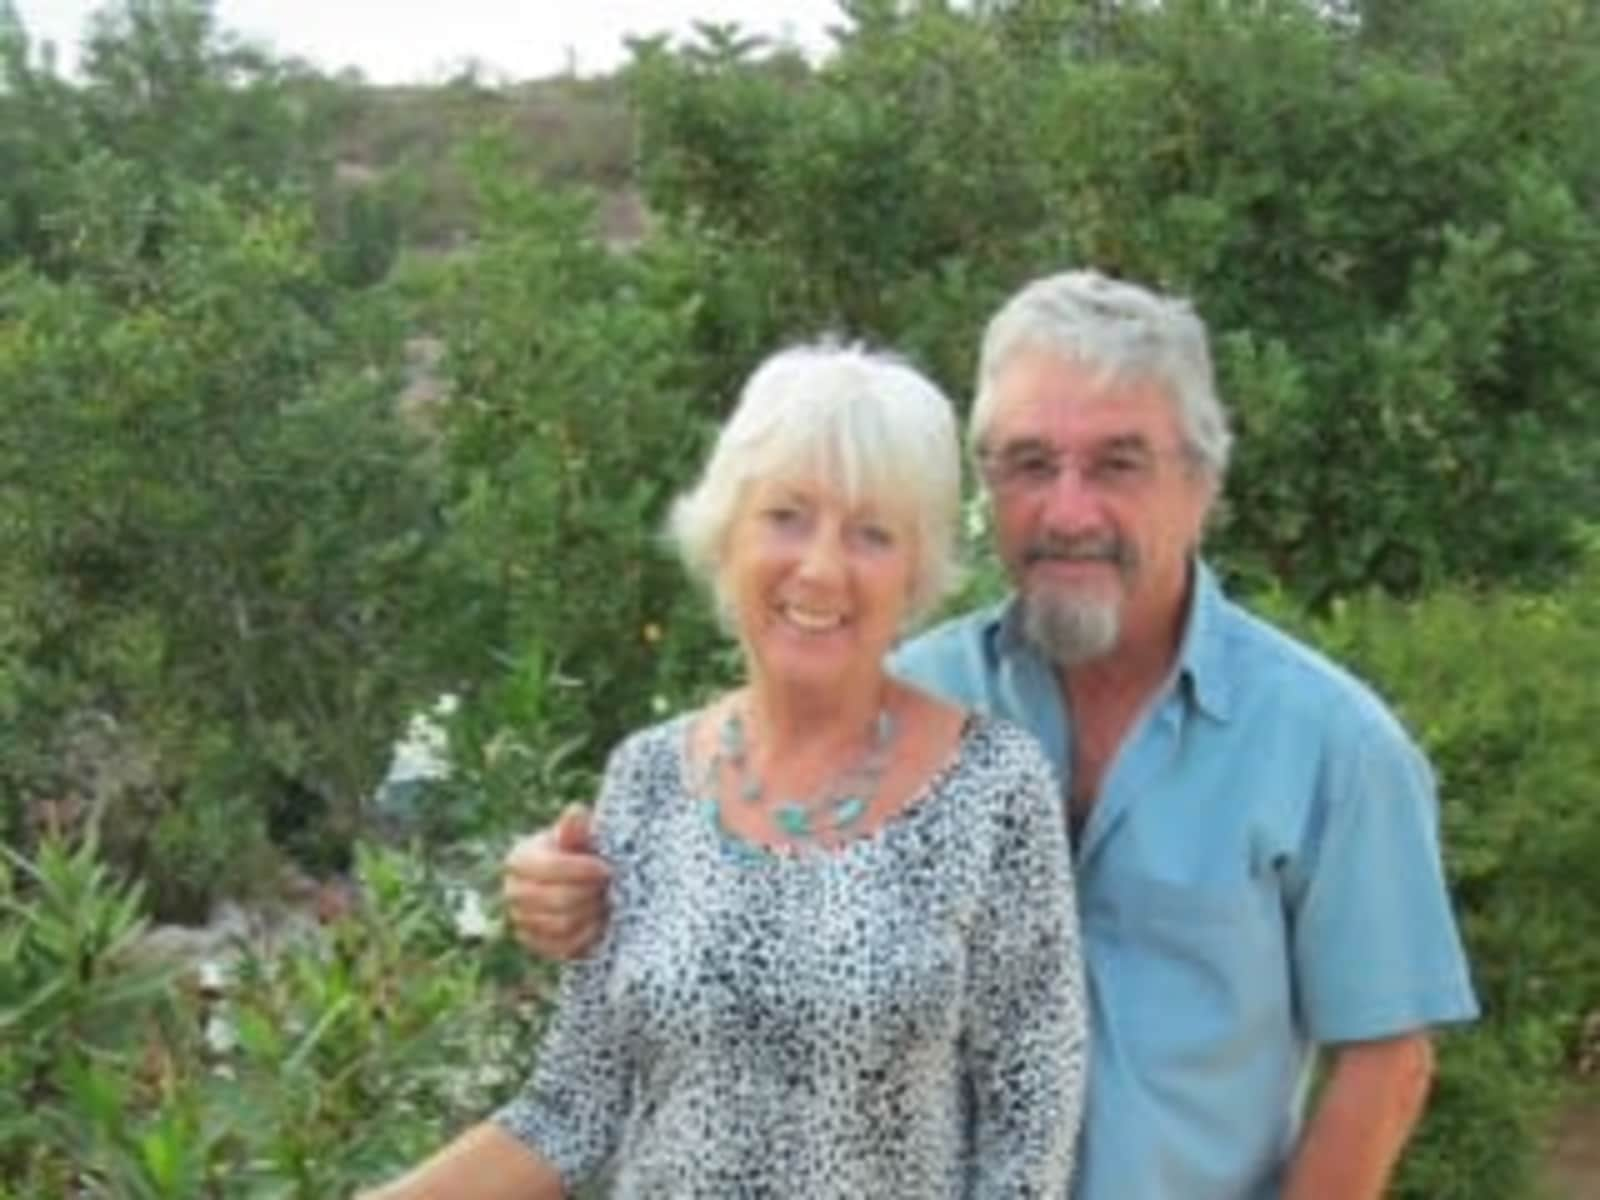 Jan & Nigel from Moncarapacho, Portugal